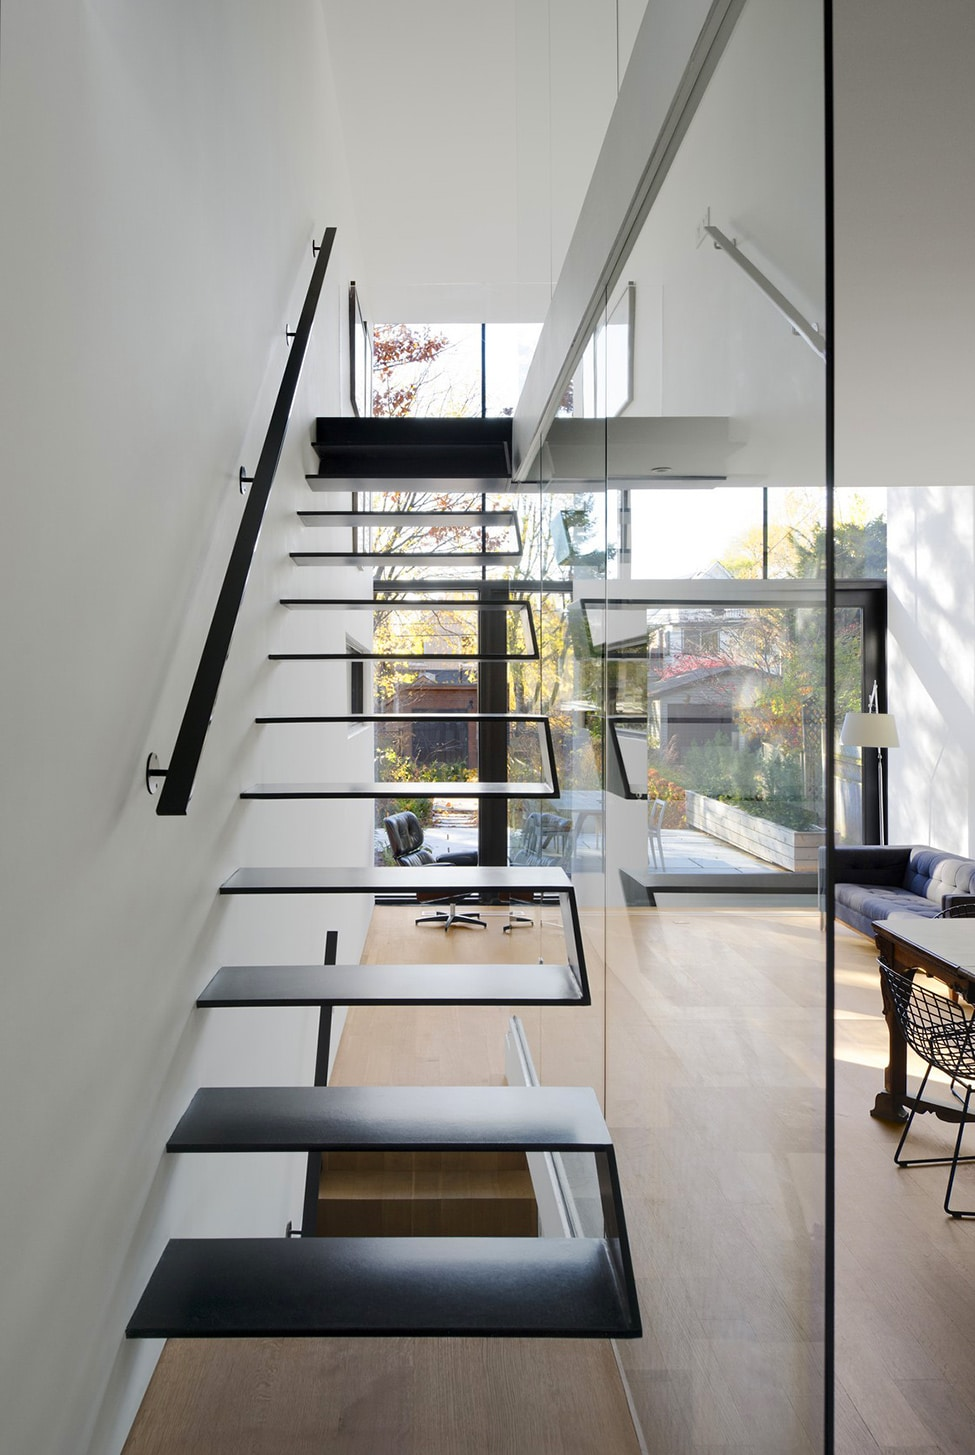 Planos de casa angosta y larga construye hogar for Gradas interiores para casas